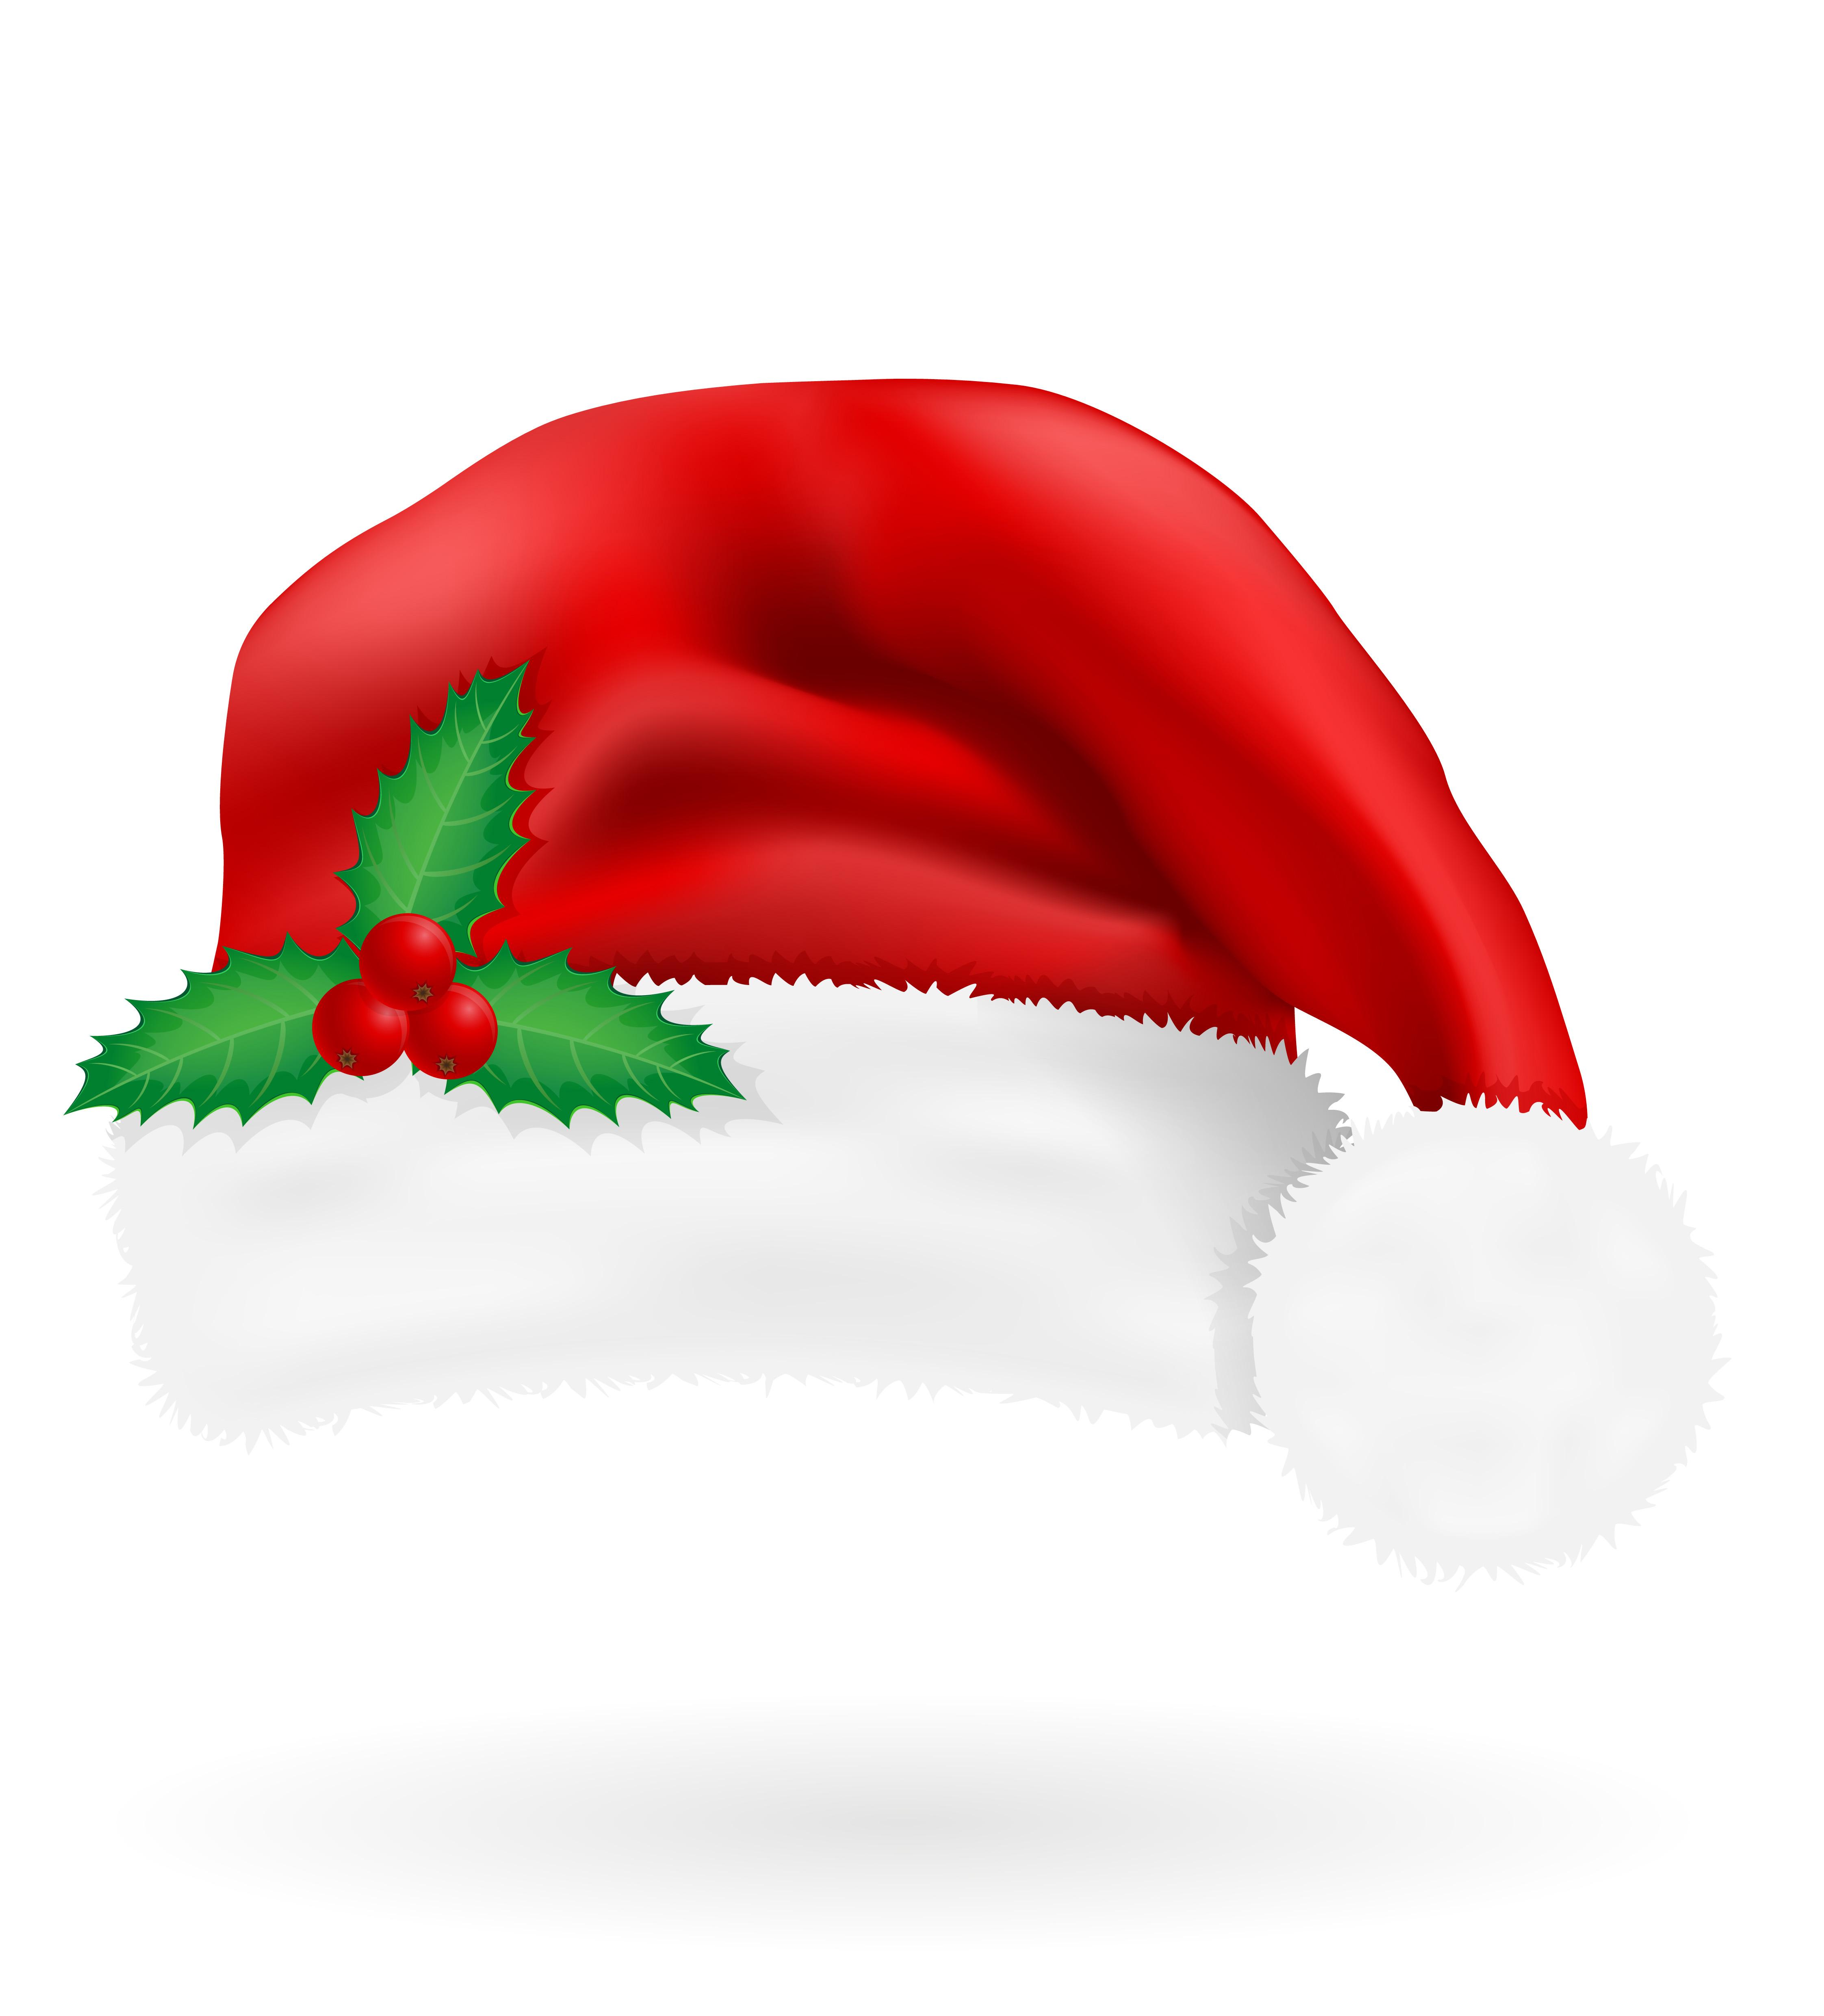 christmas red hat santa claus vector illustration 515543 ...